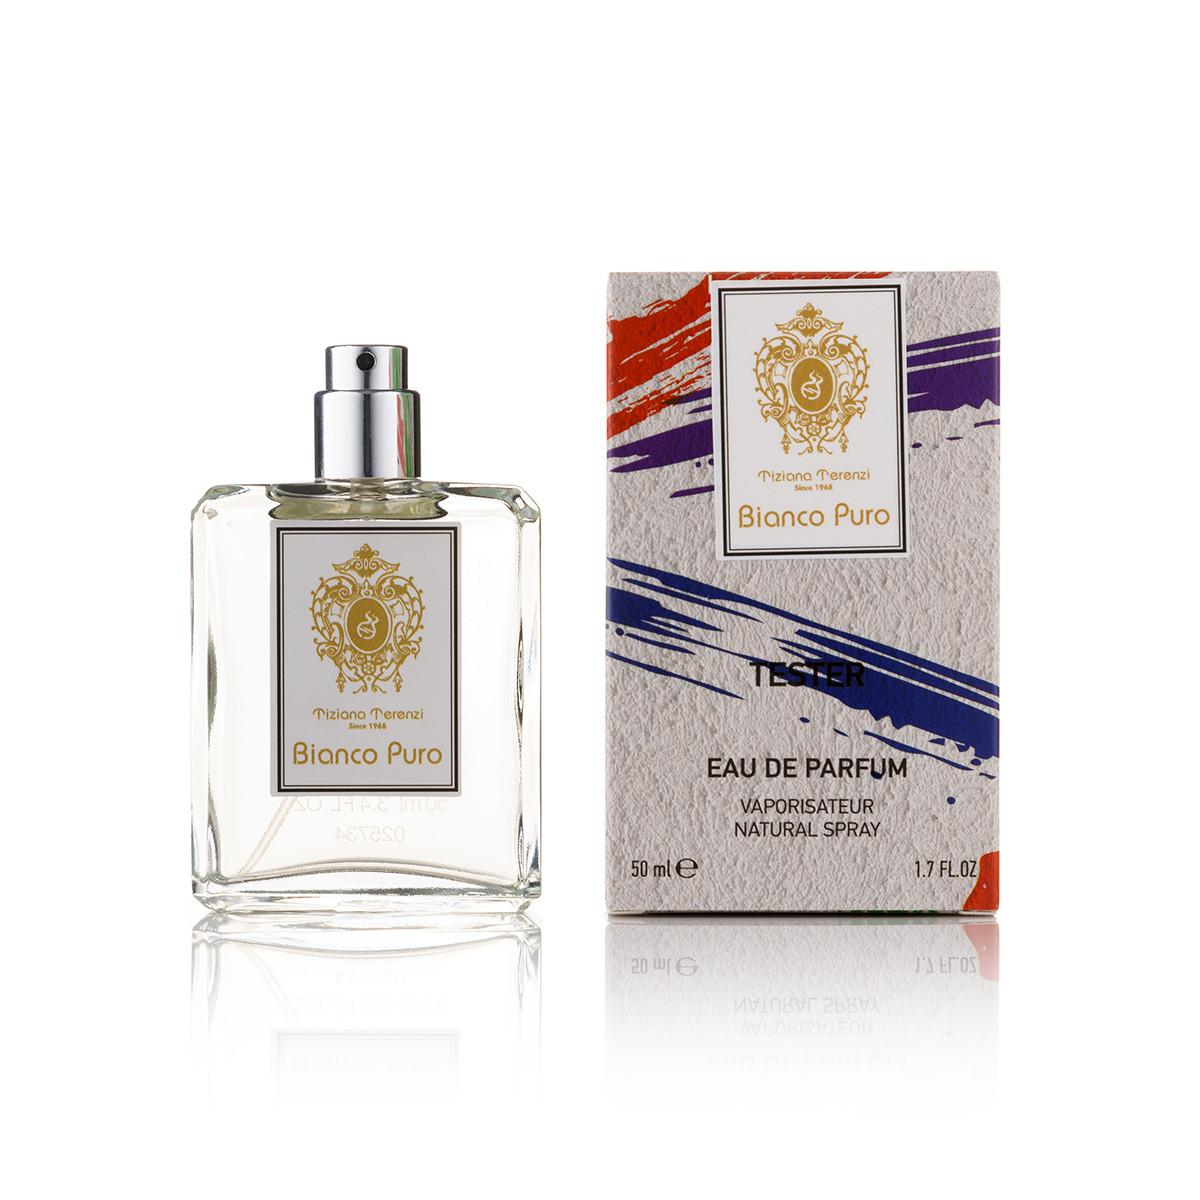 Мини-парфюм тестер Tiziana Terenzi Bianco Puro  - 50 мл (Унисекс) (new)